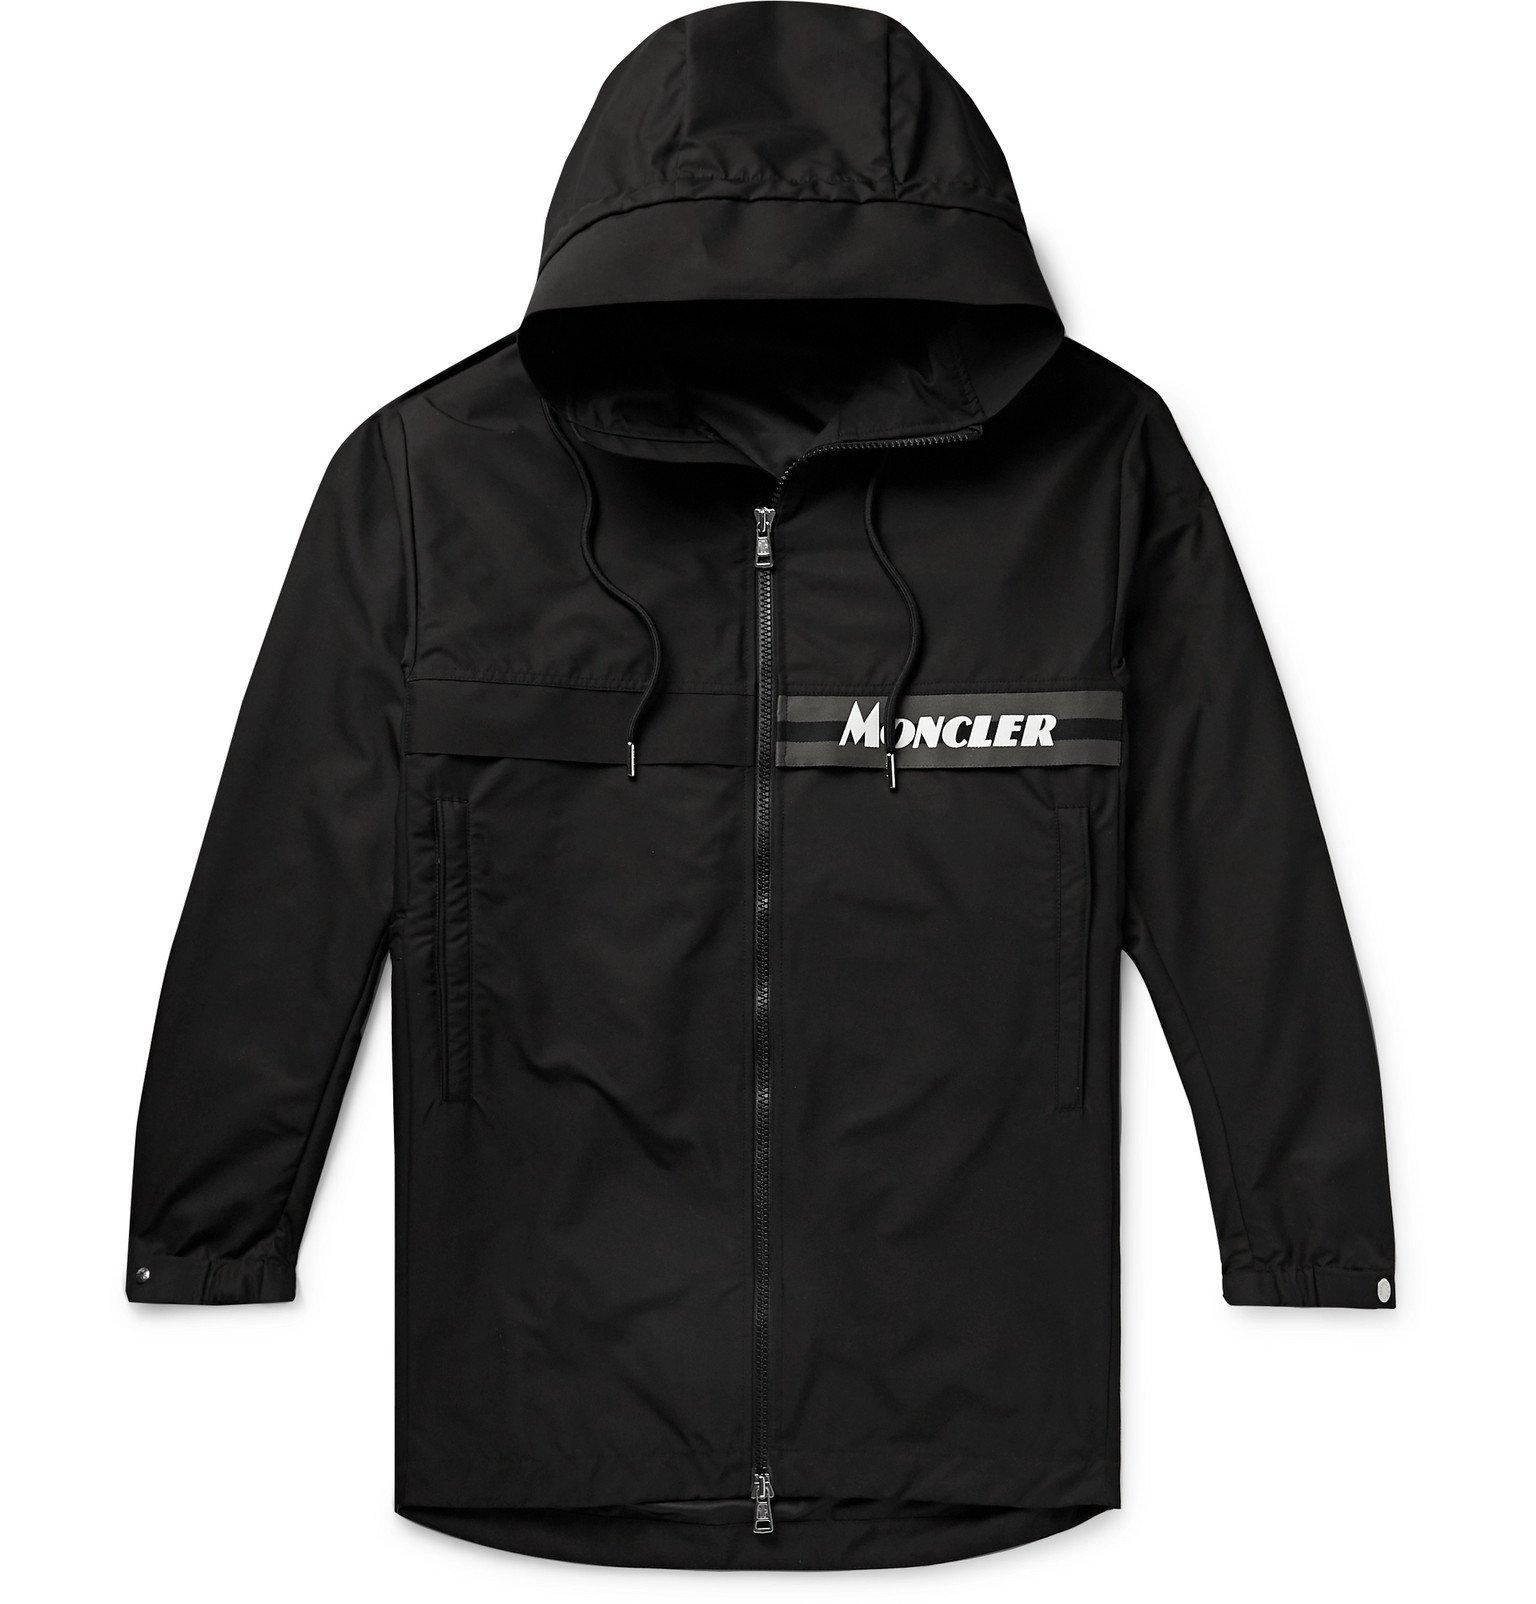 Moncler - Ildut Reflective-Trimmed Logo-Print Shell Hooded Jacket - Black